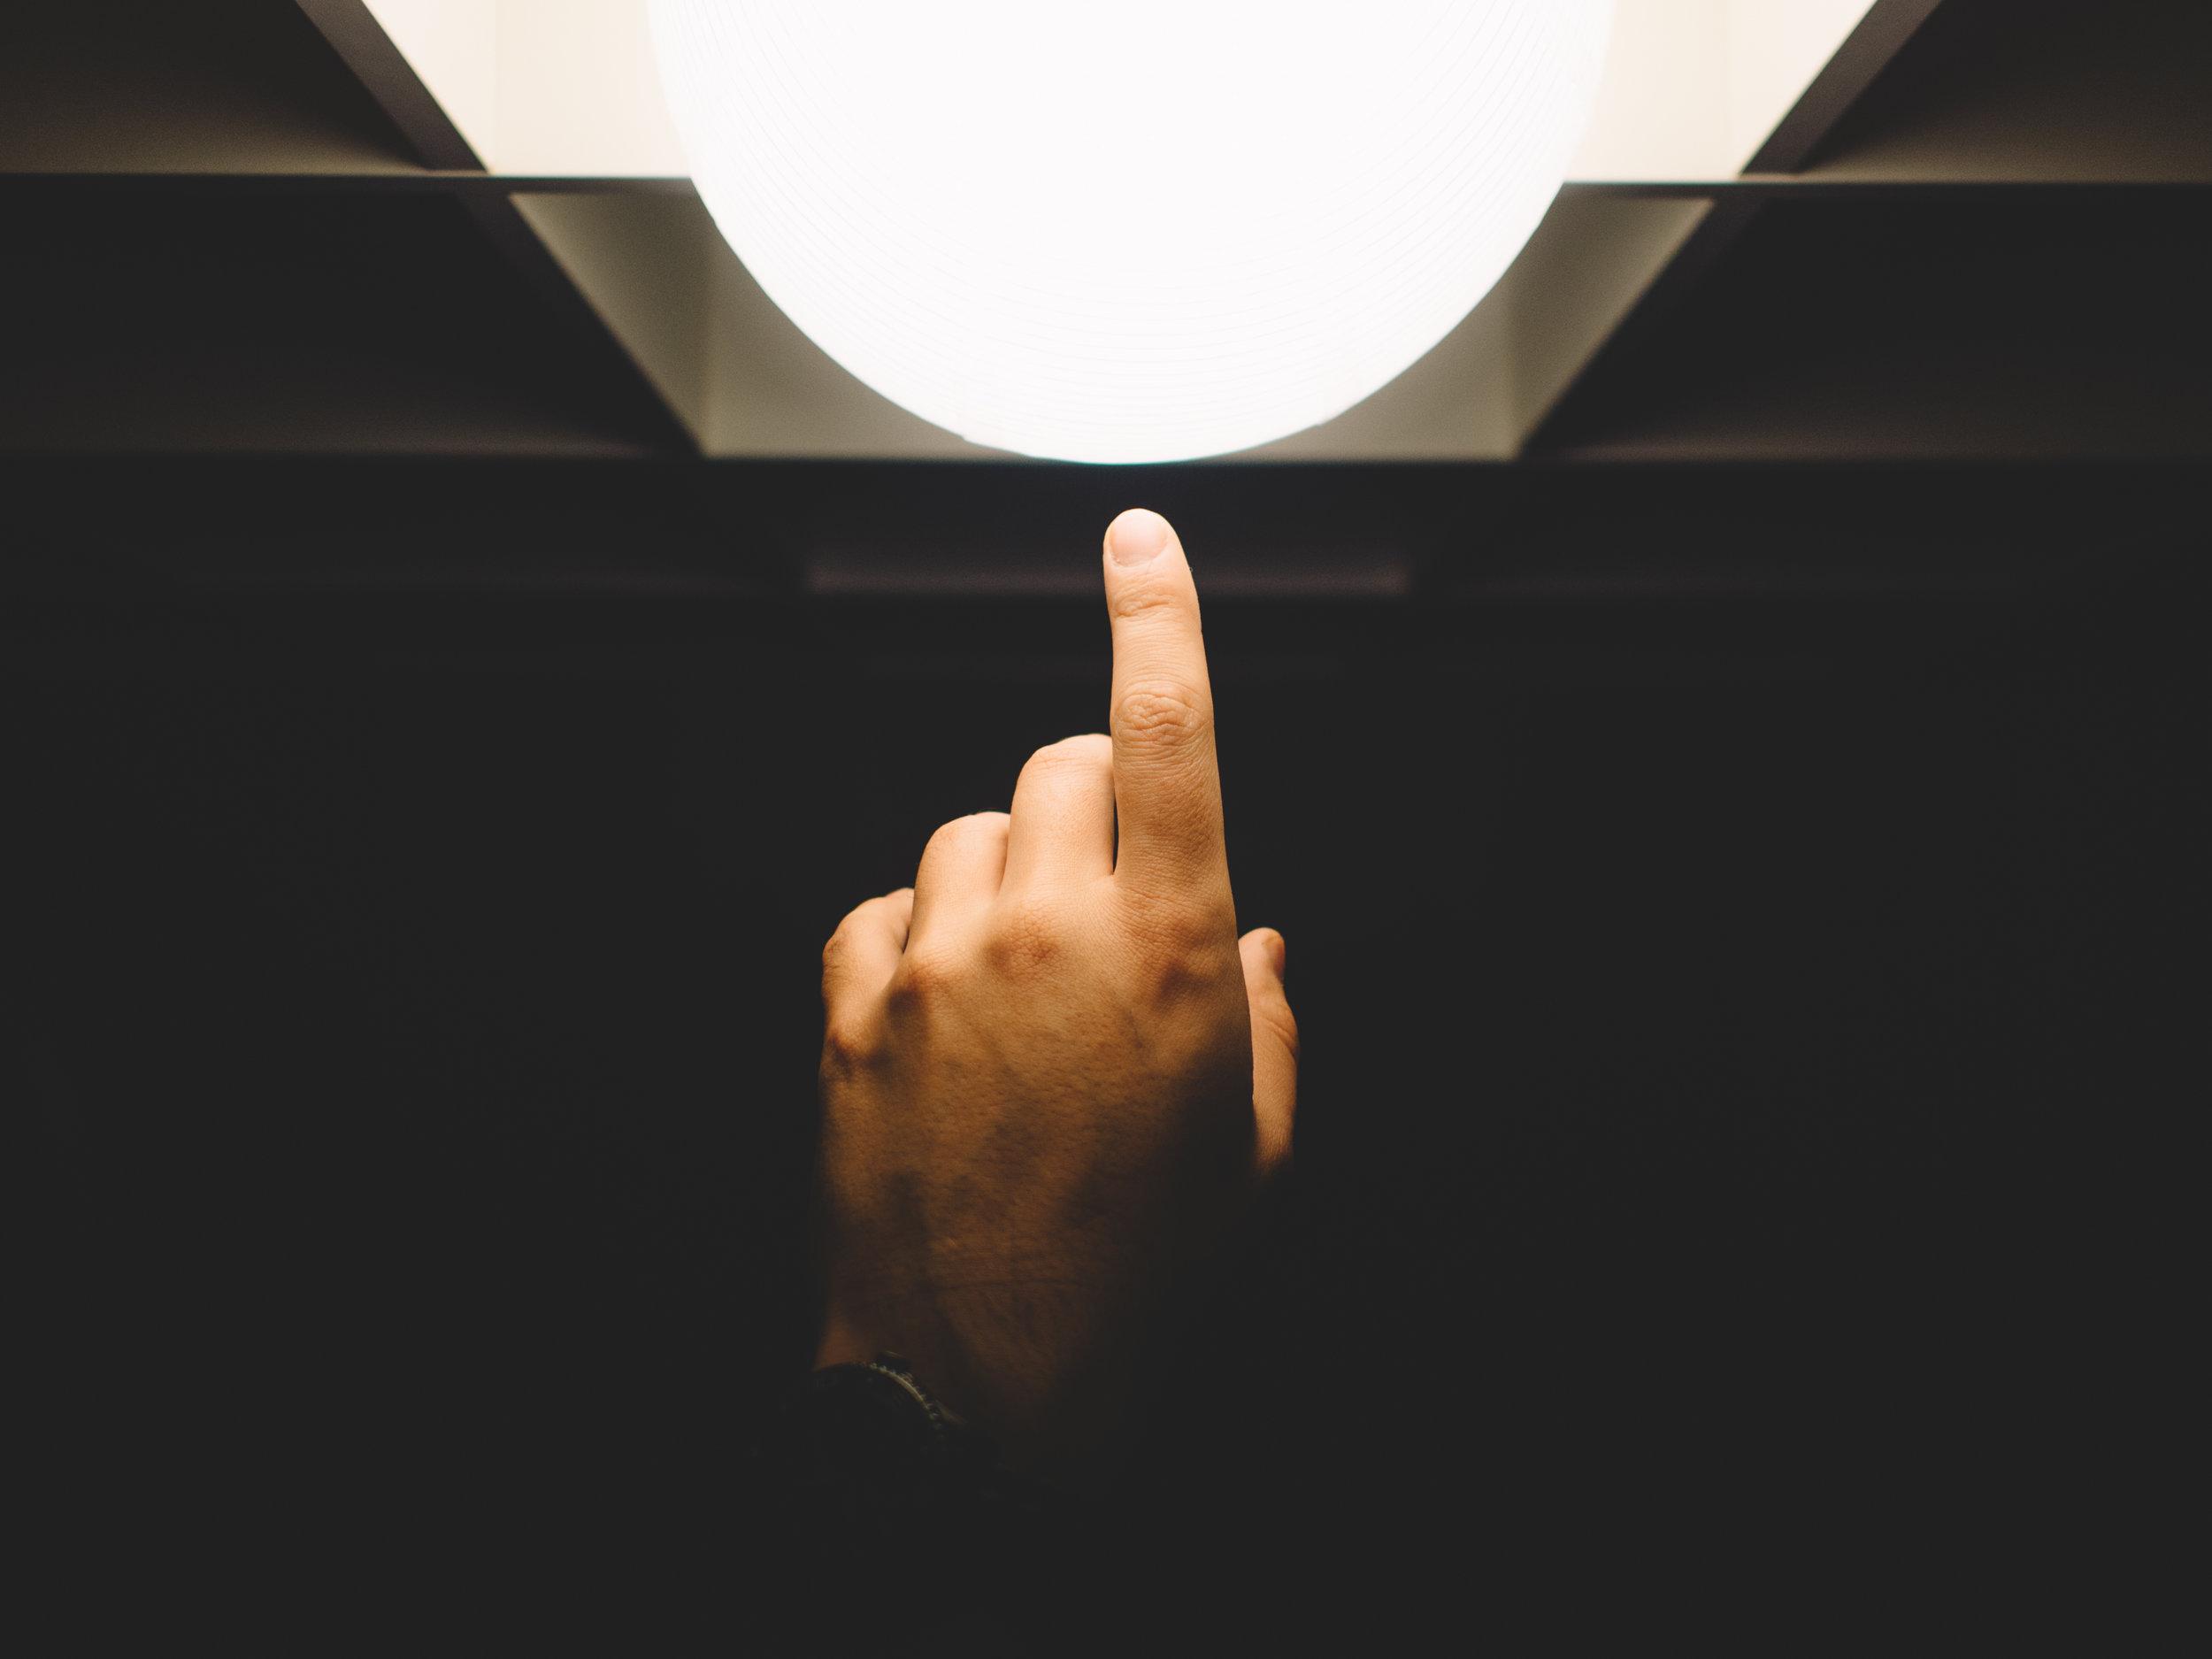 lamp-finger-touch-hand-85886.jpeg